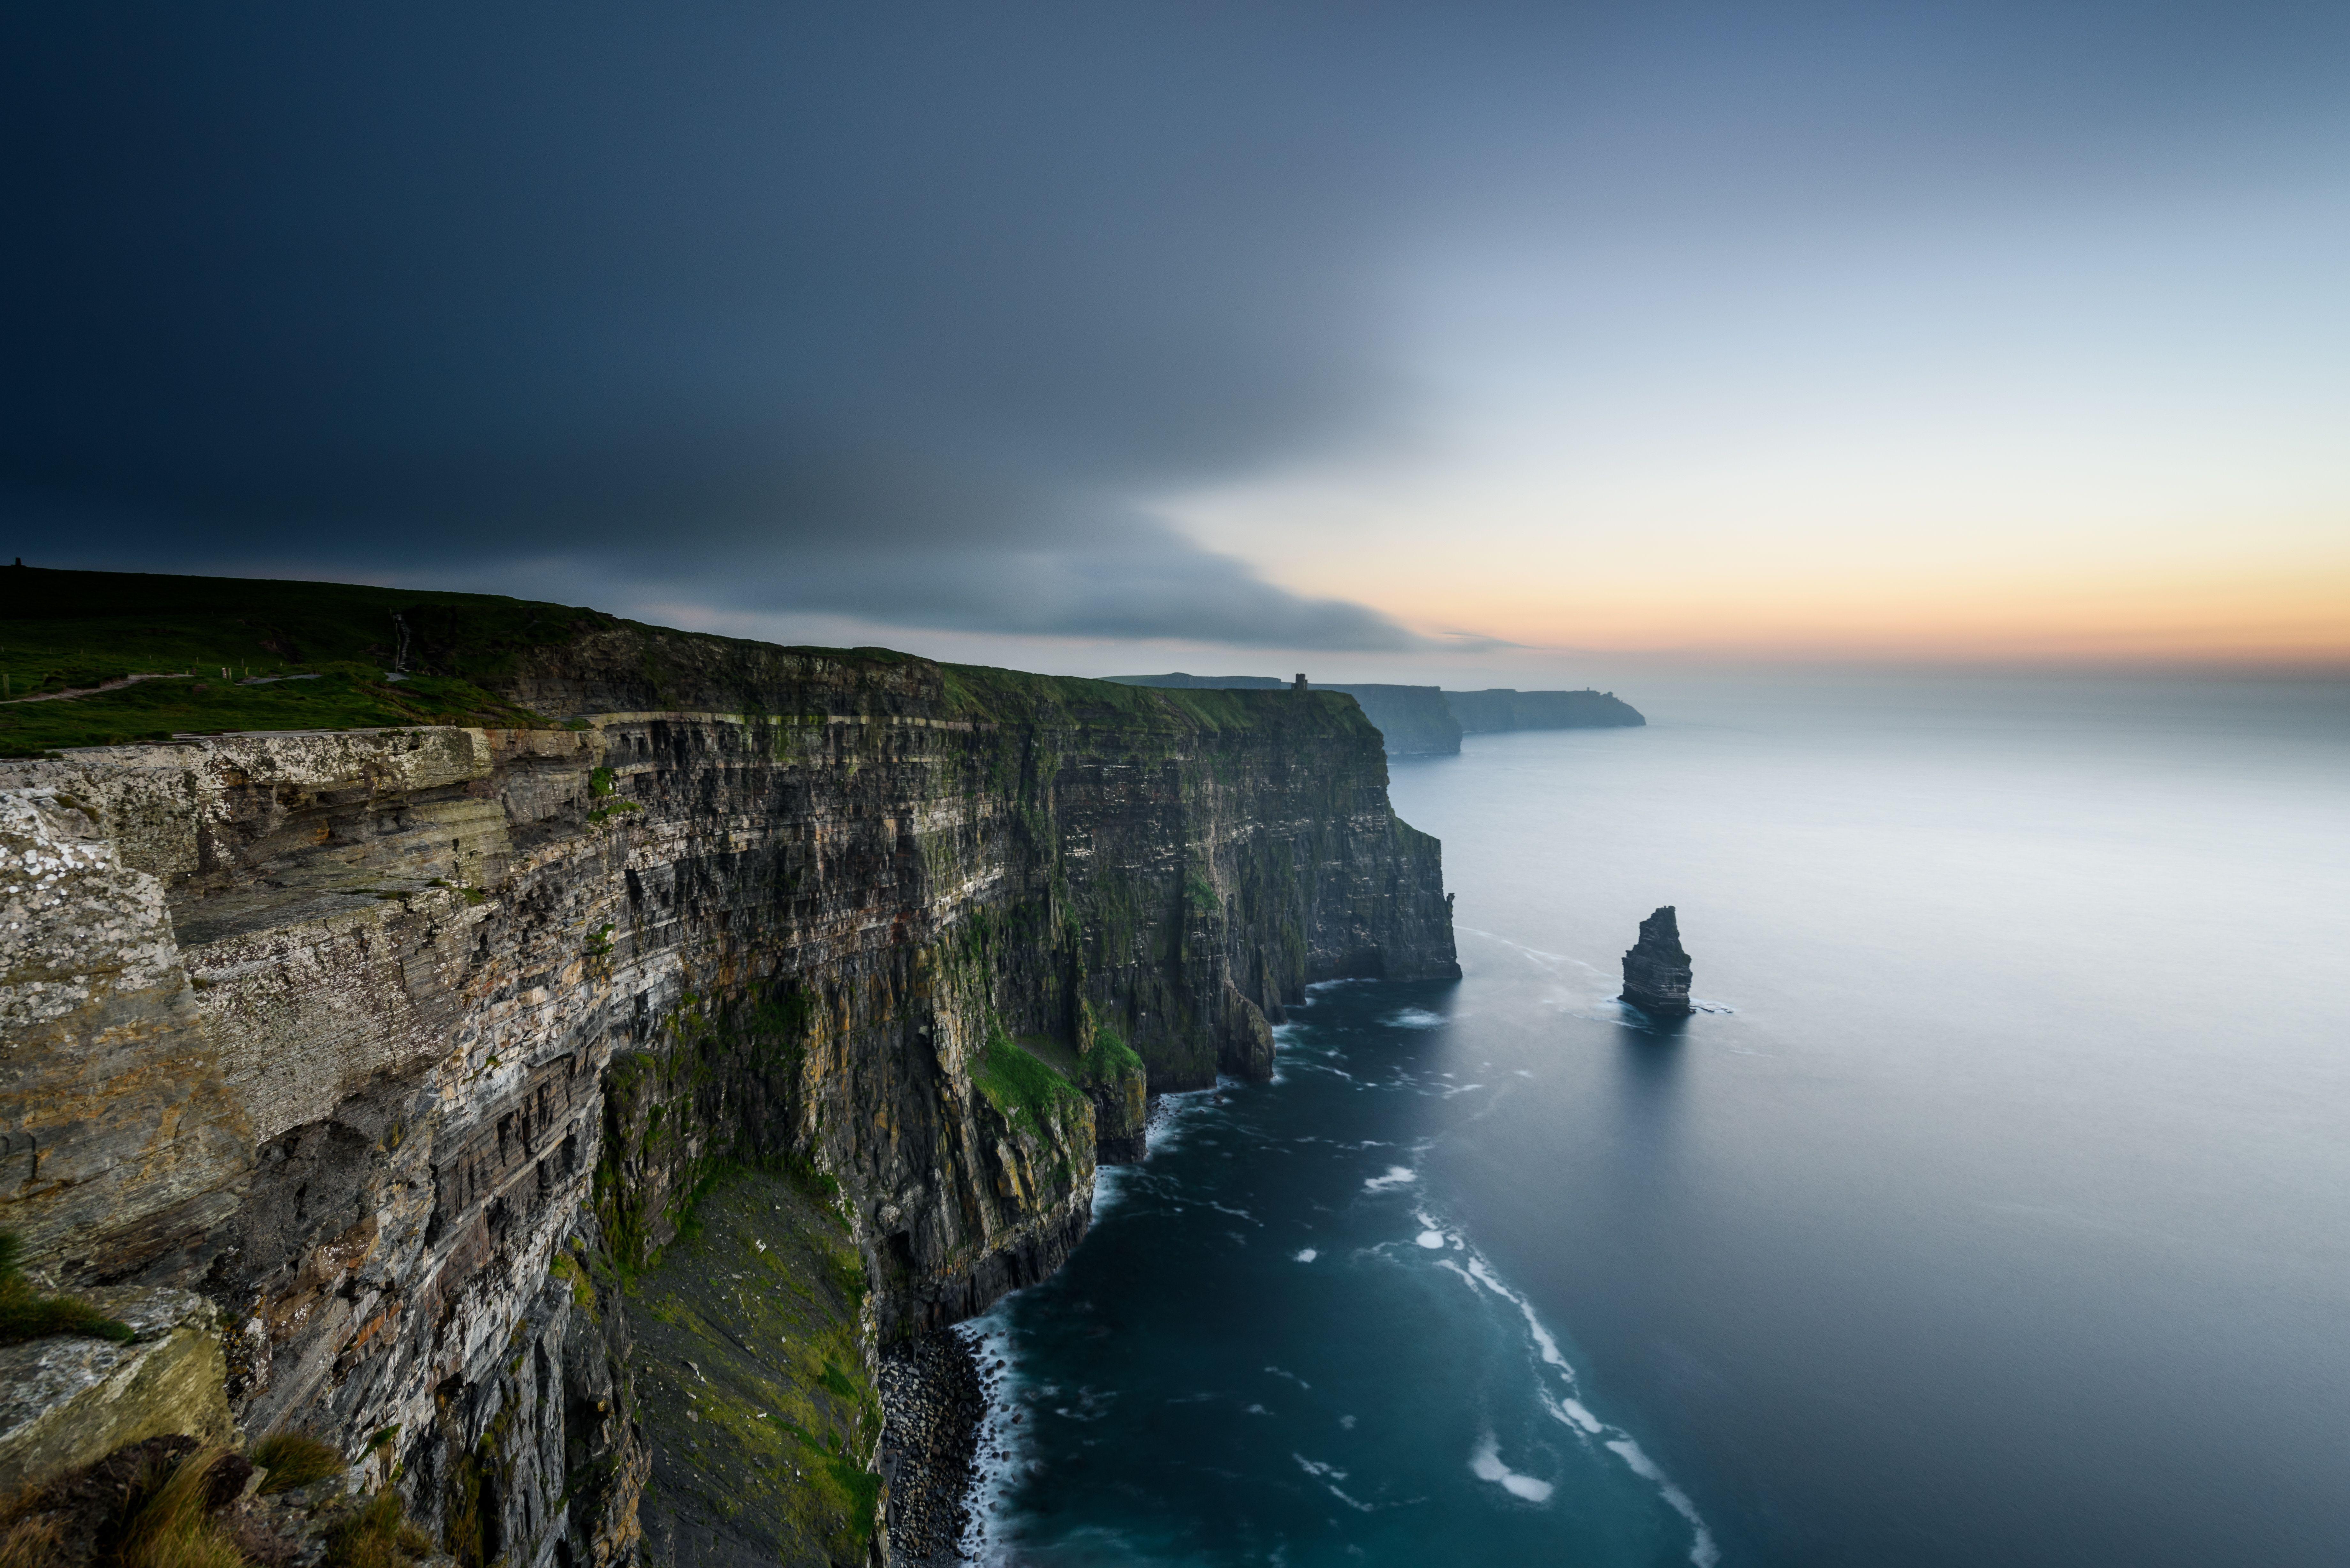 Ireland Wallpapers   Top Ireland Backgrounds   WallpaperAccess 7360x4912